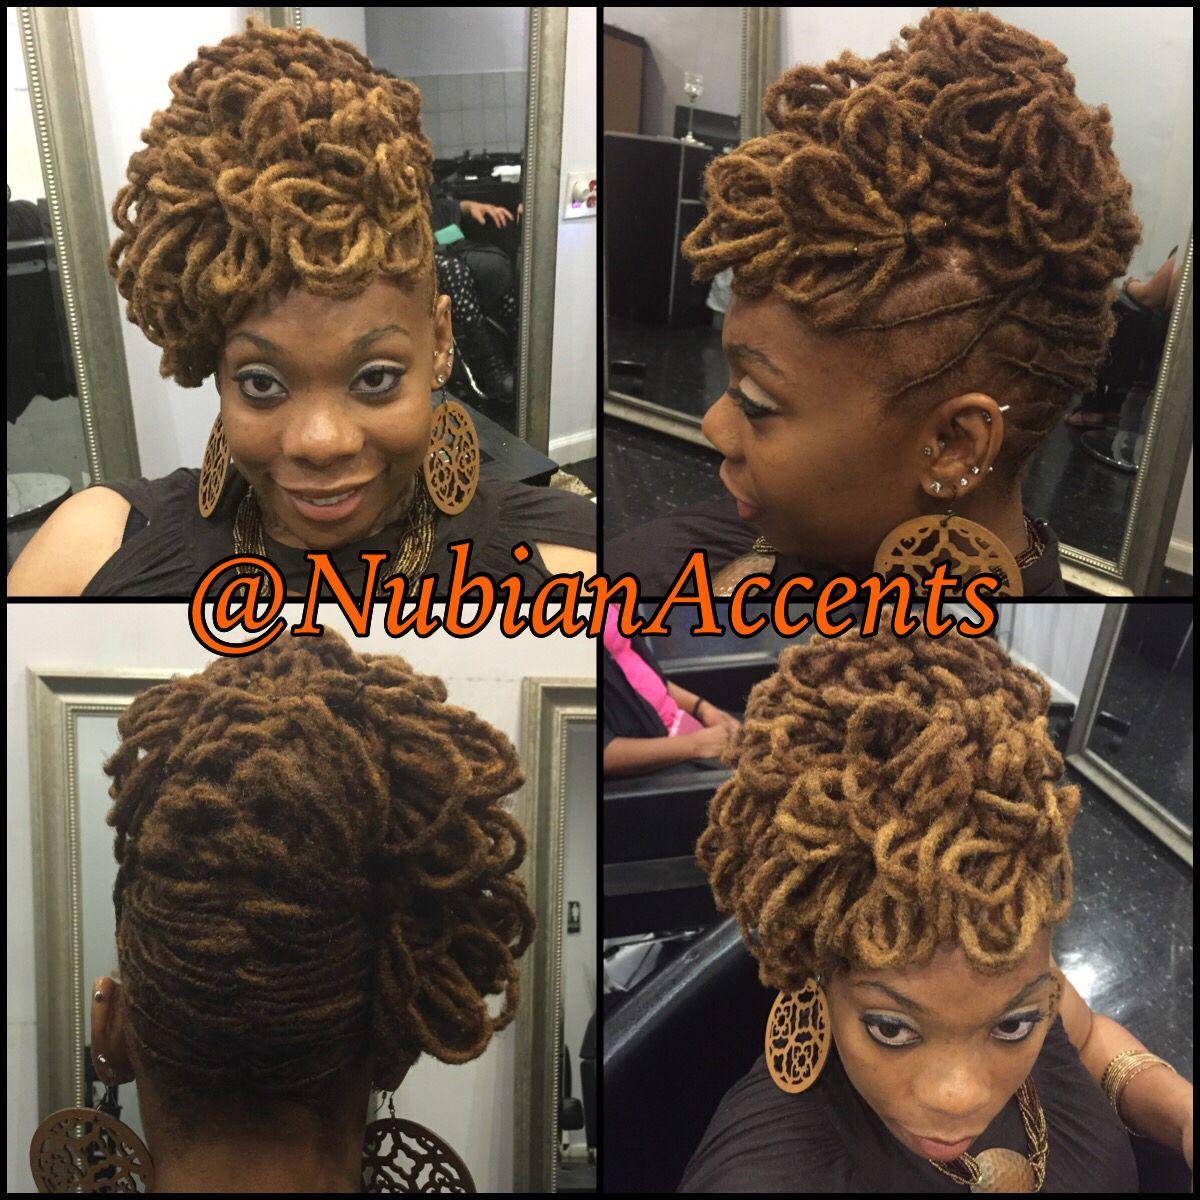 Loc petal updo nubianaccents hairstyles pinterest updo locs